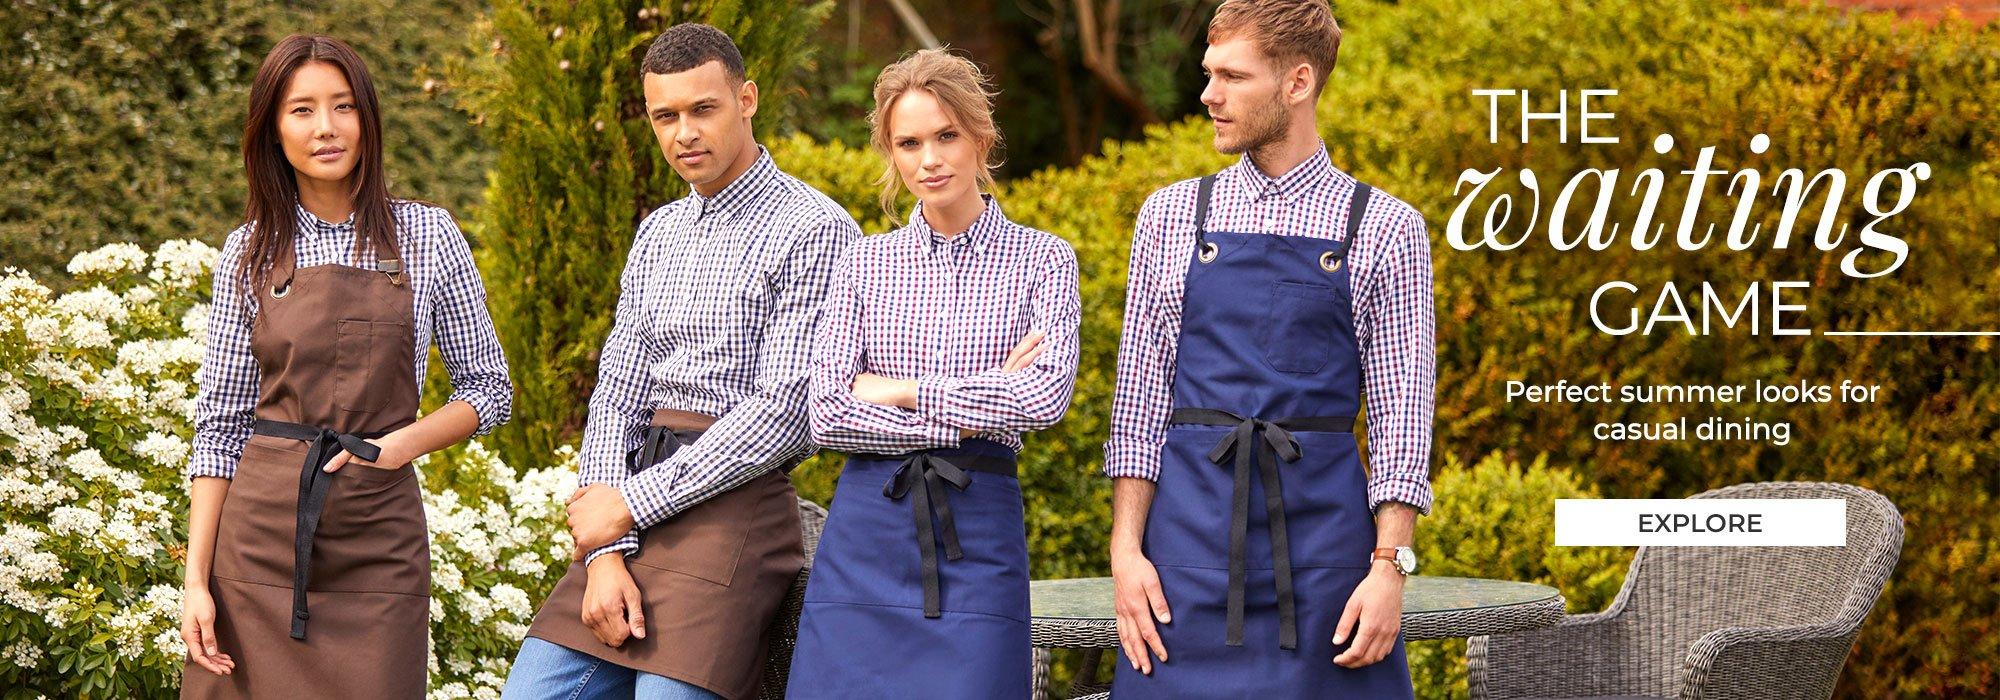 e536b9af27a Simon Jersey: Staff Uniform & Workwear Suppliers | Work Uniforms